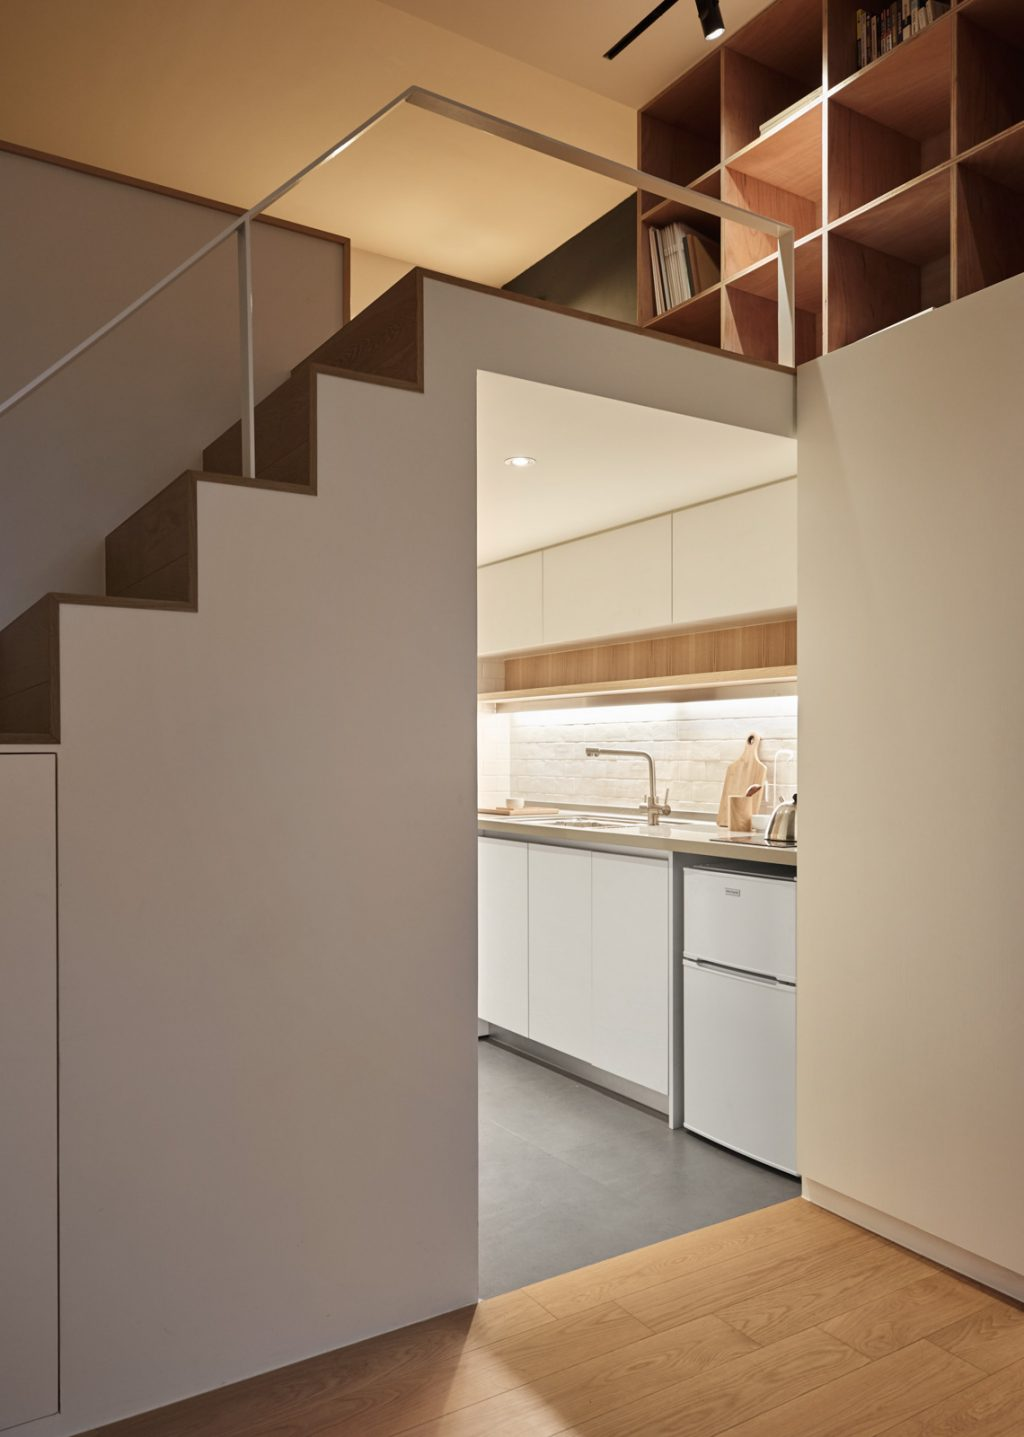 9.kitchen-beneath-lofted-bedroom